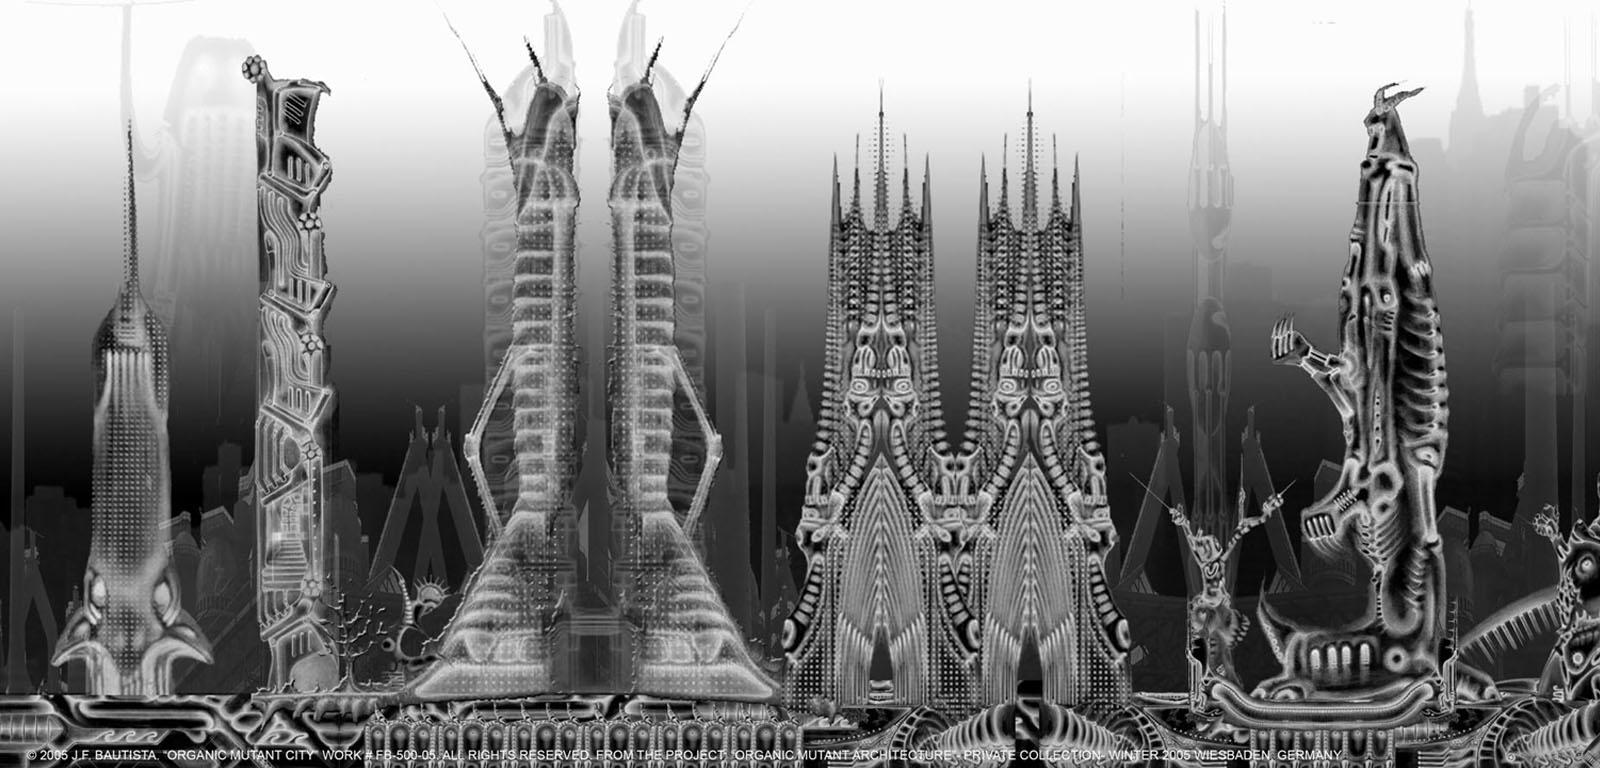 Organic Mutant Architecture